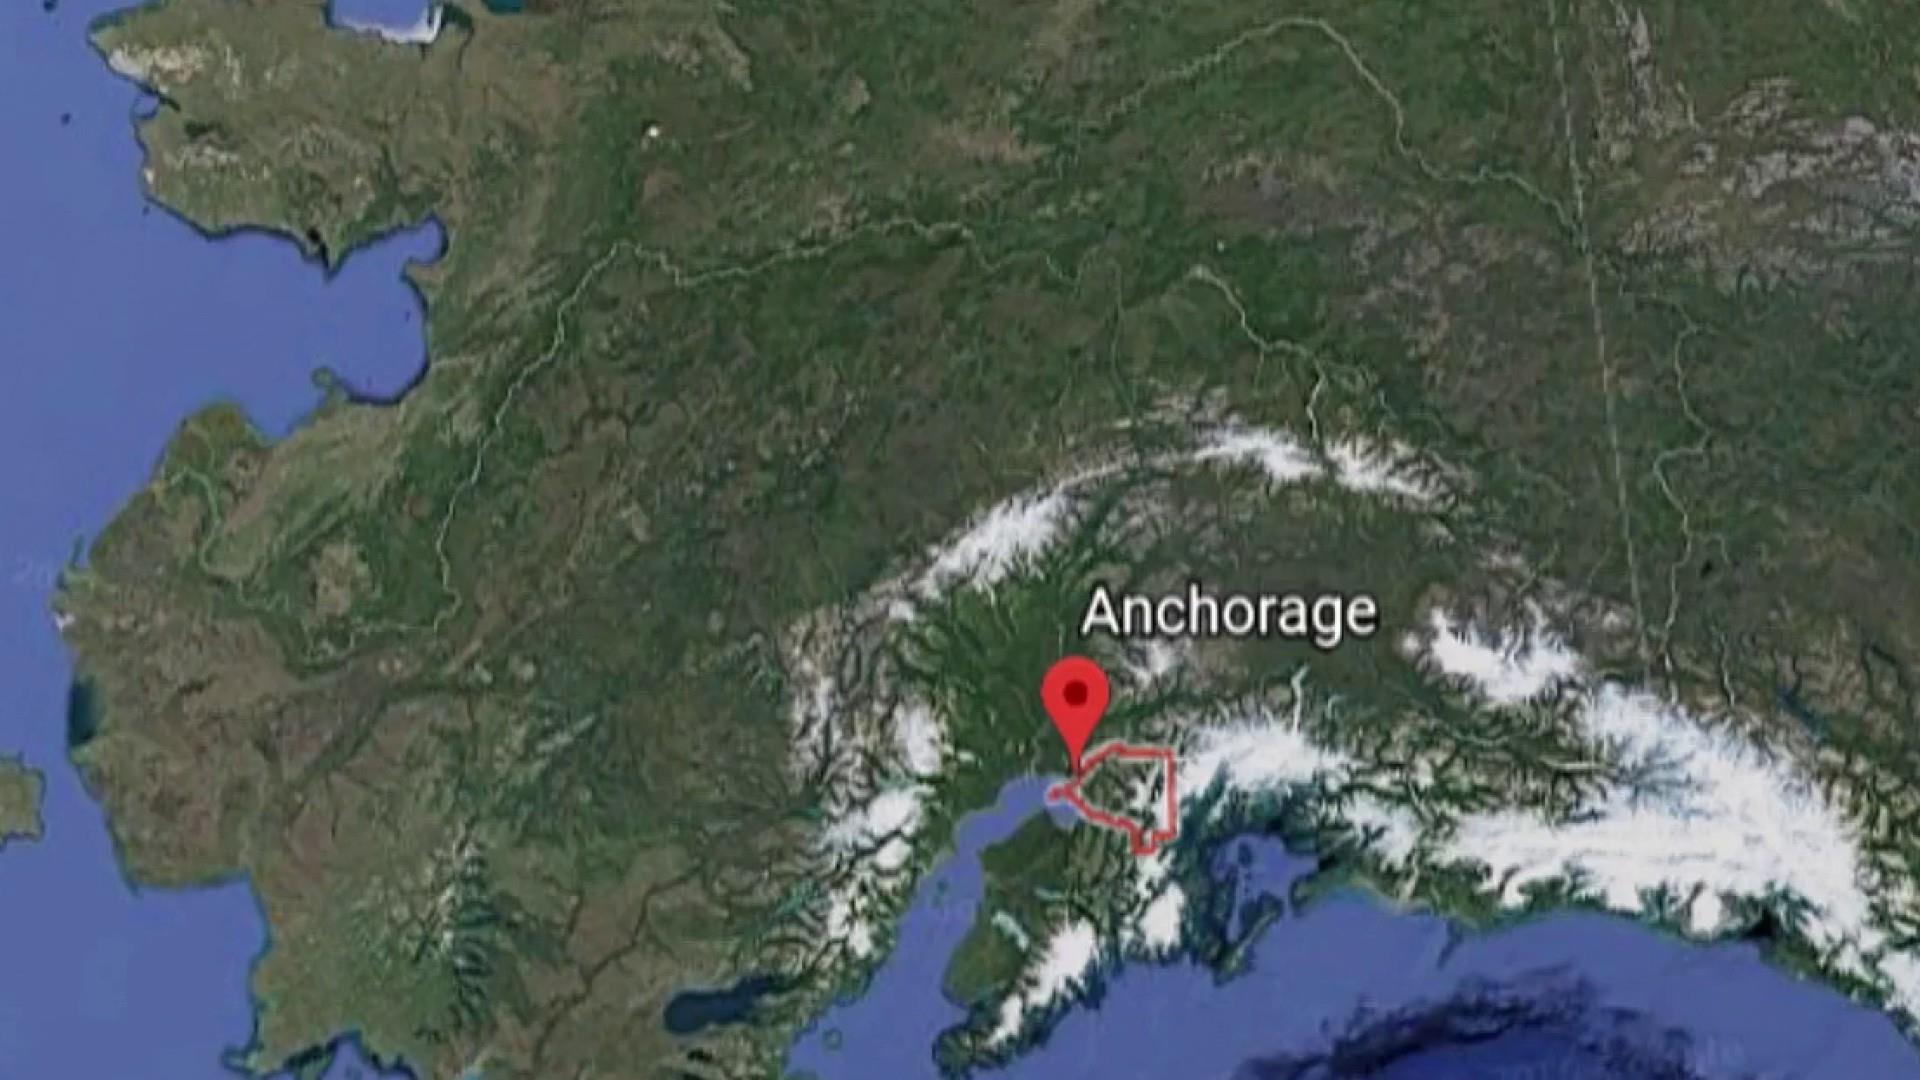 Alaska under tsunami watch after 7.0 earthquake hits near Anchorage